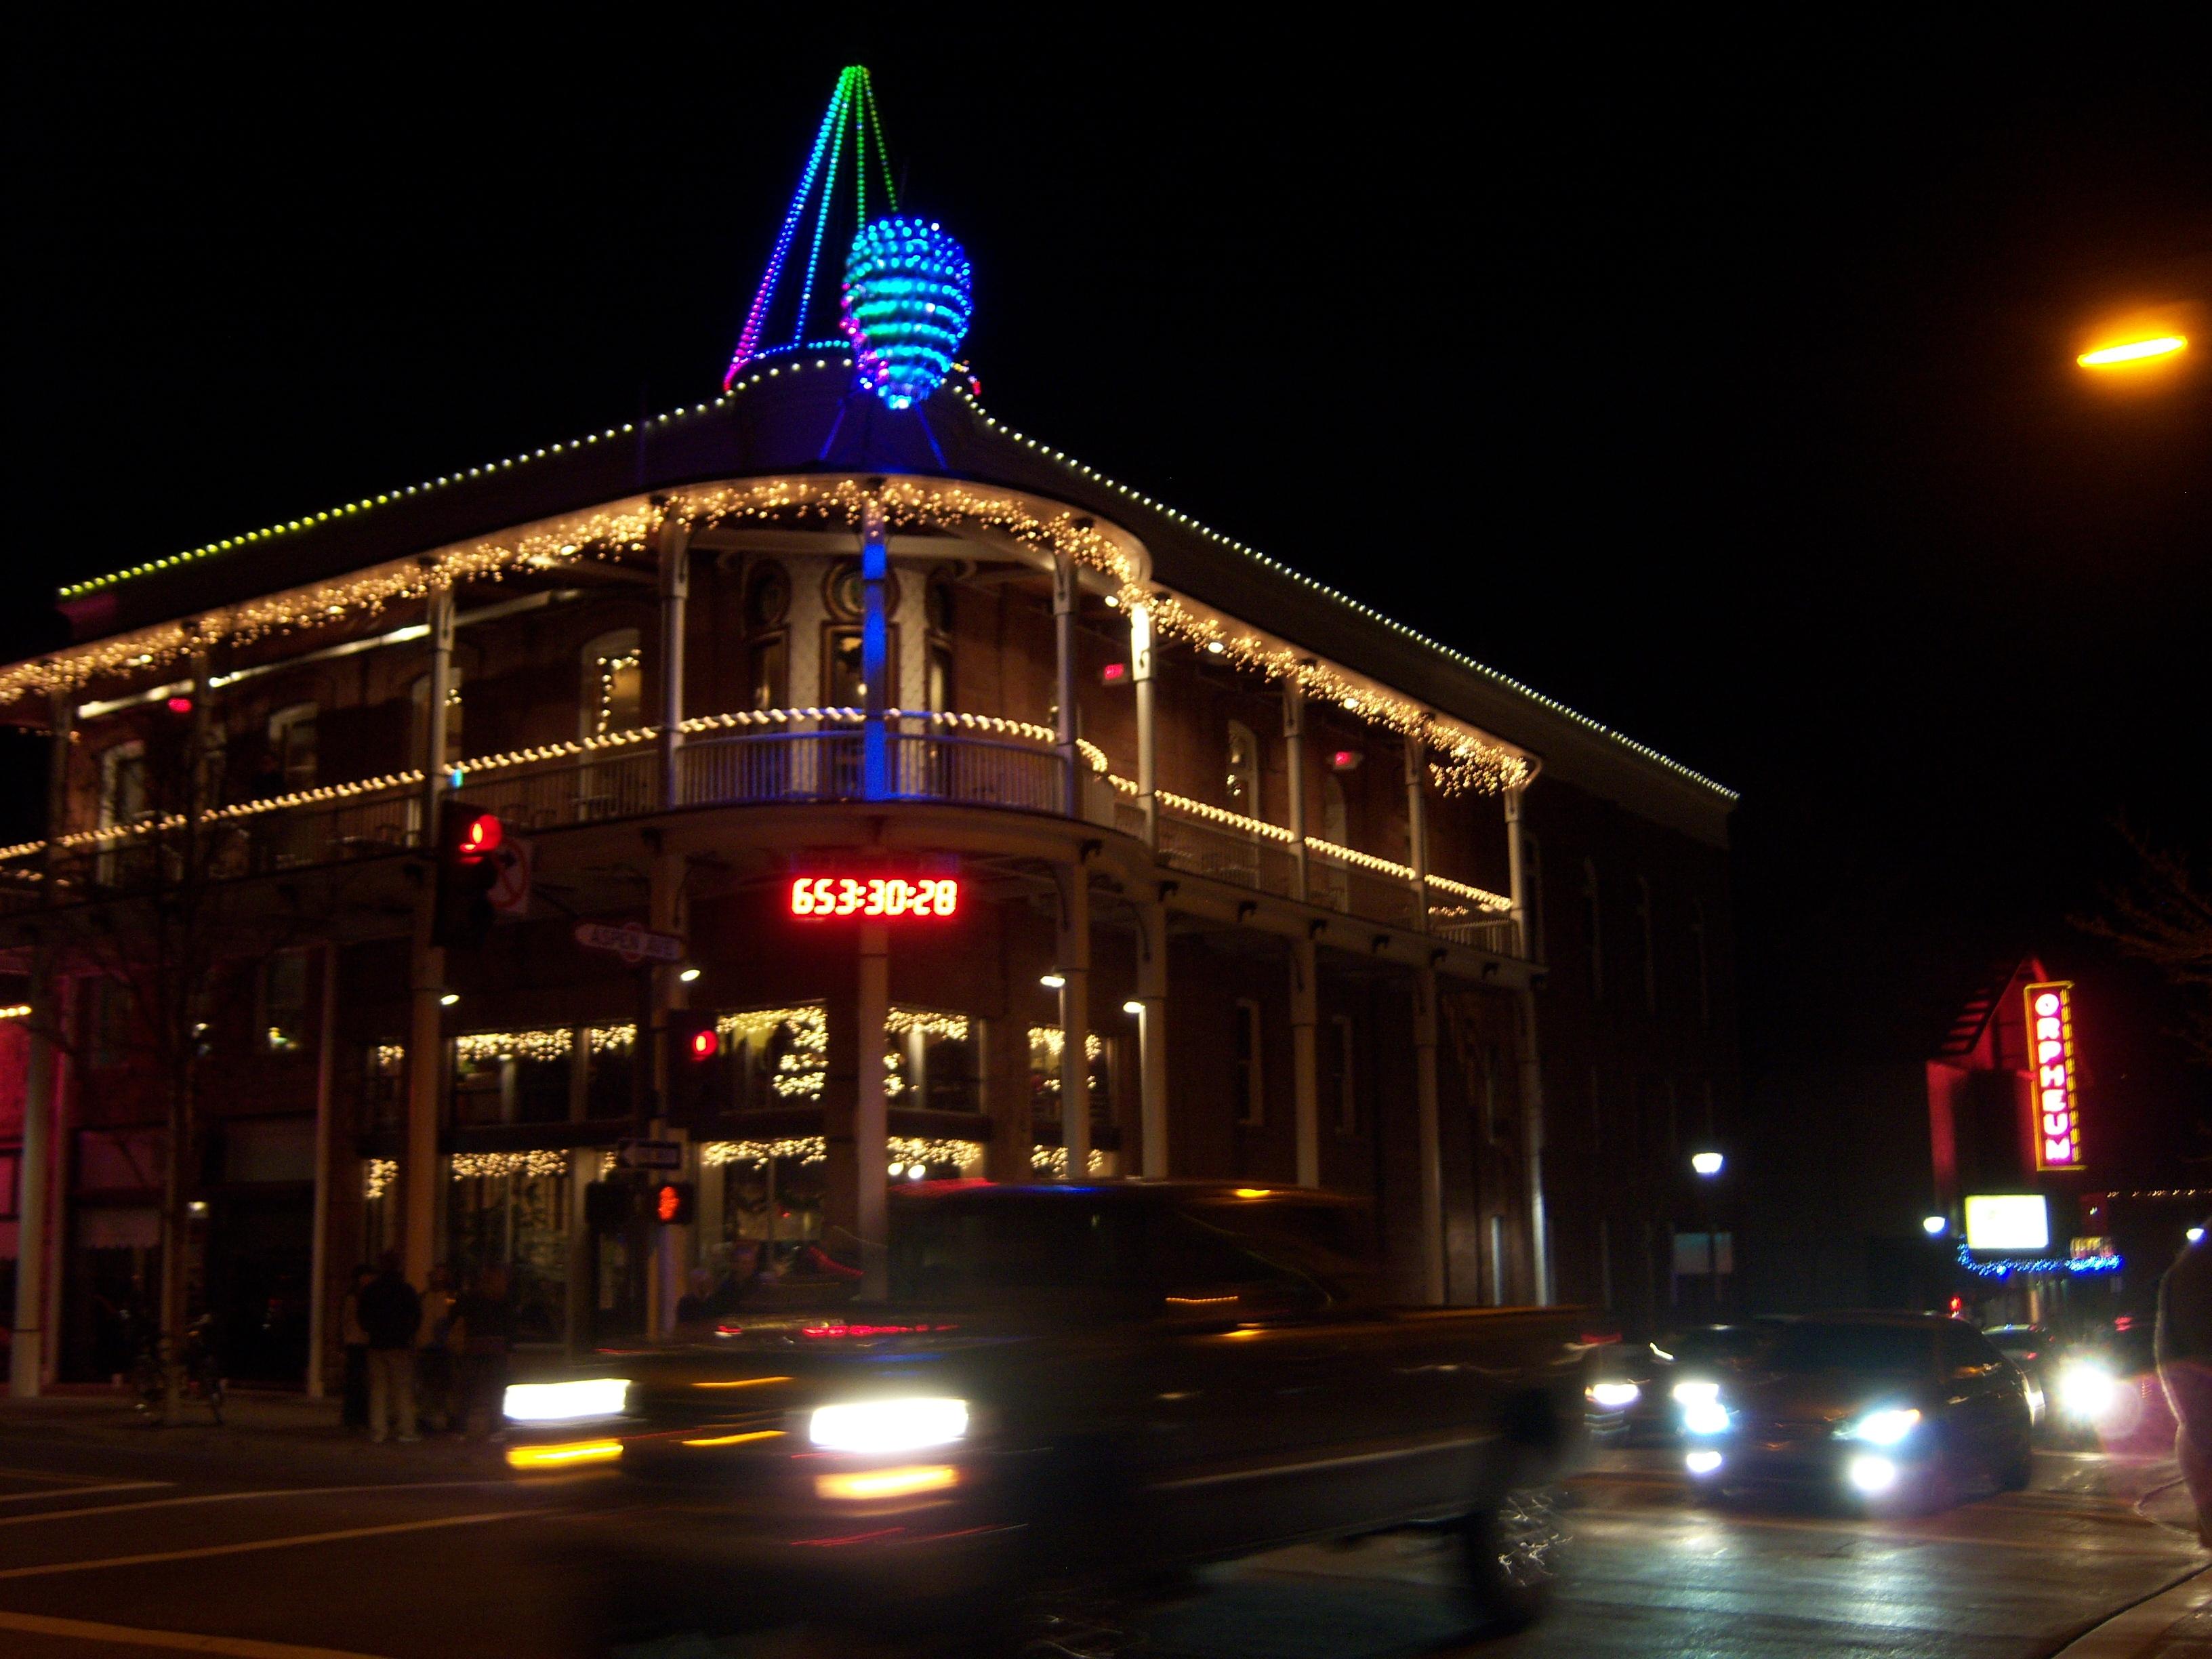 Flagstaff Art Walk, Architecture, Arizona, Building, Christmas, HQ Photo